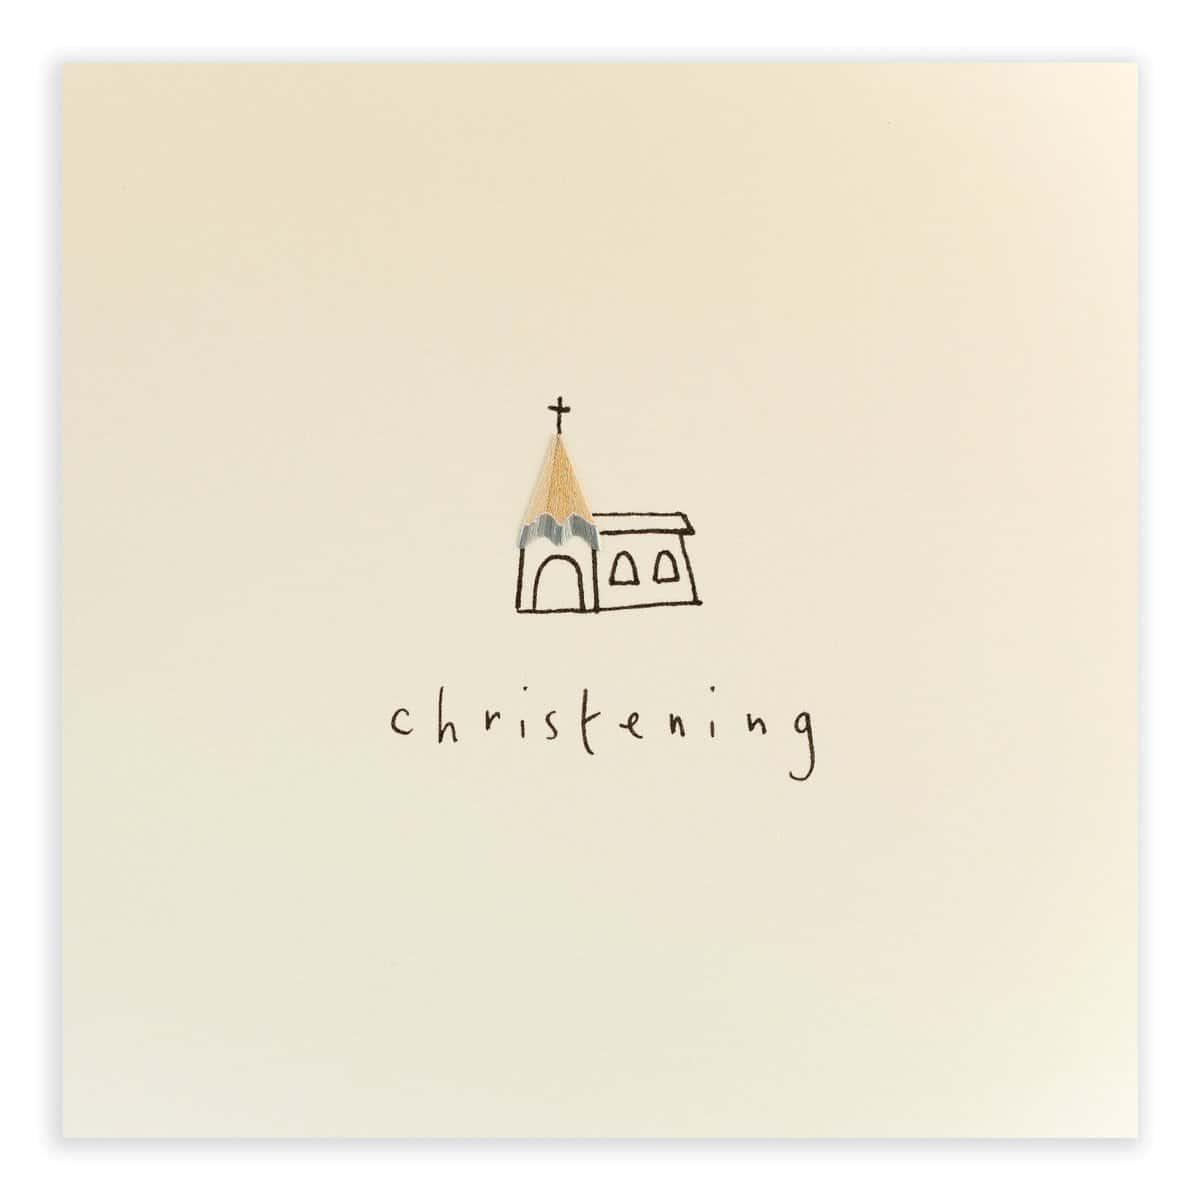 Christening church by ruth jackson